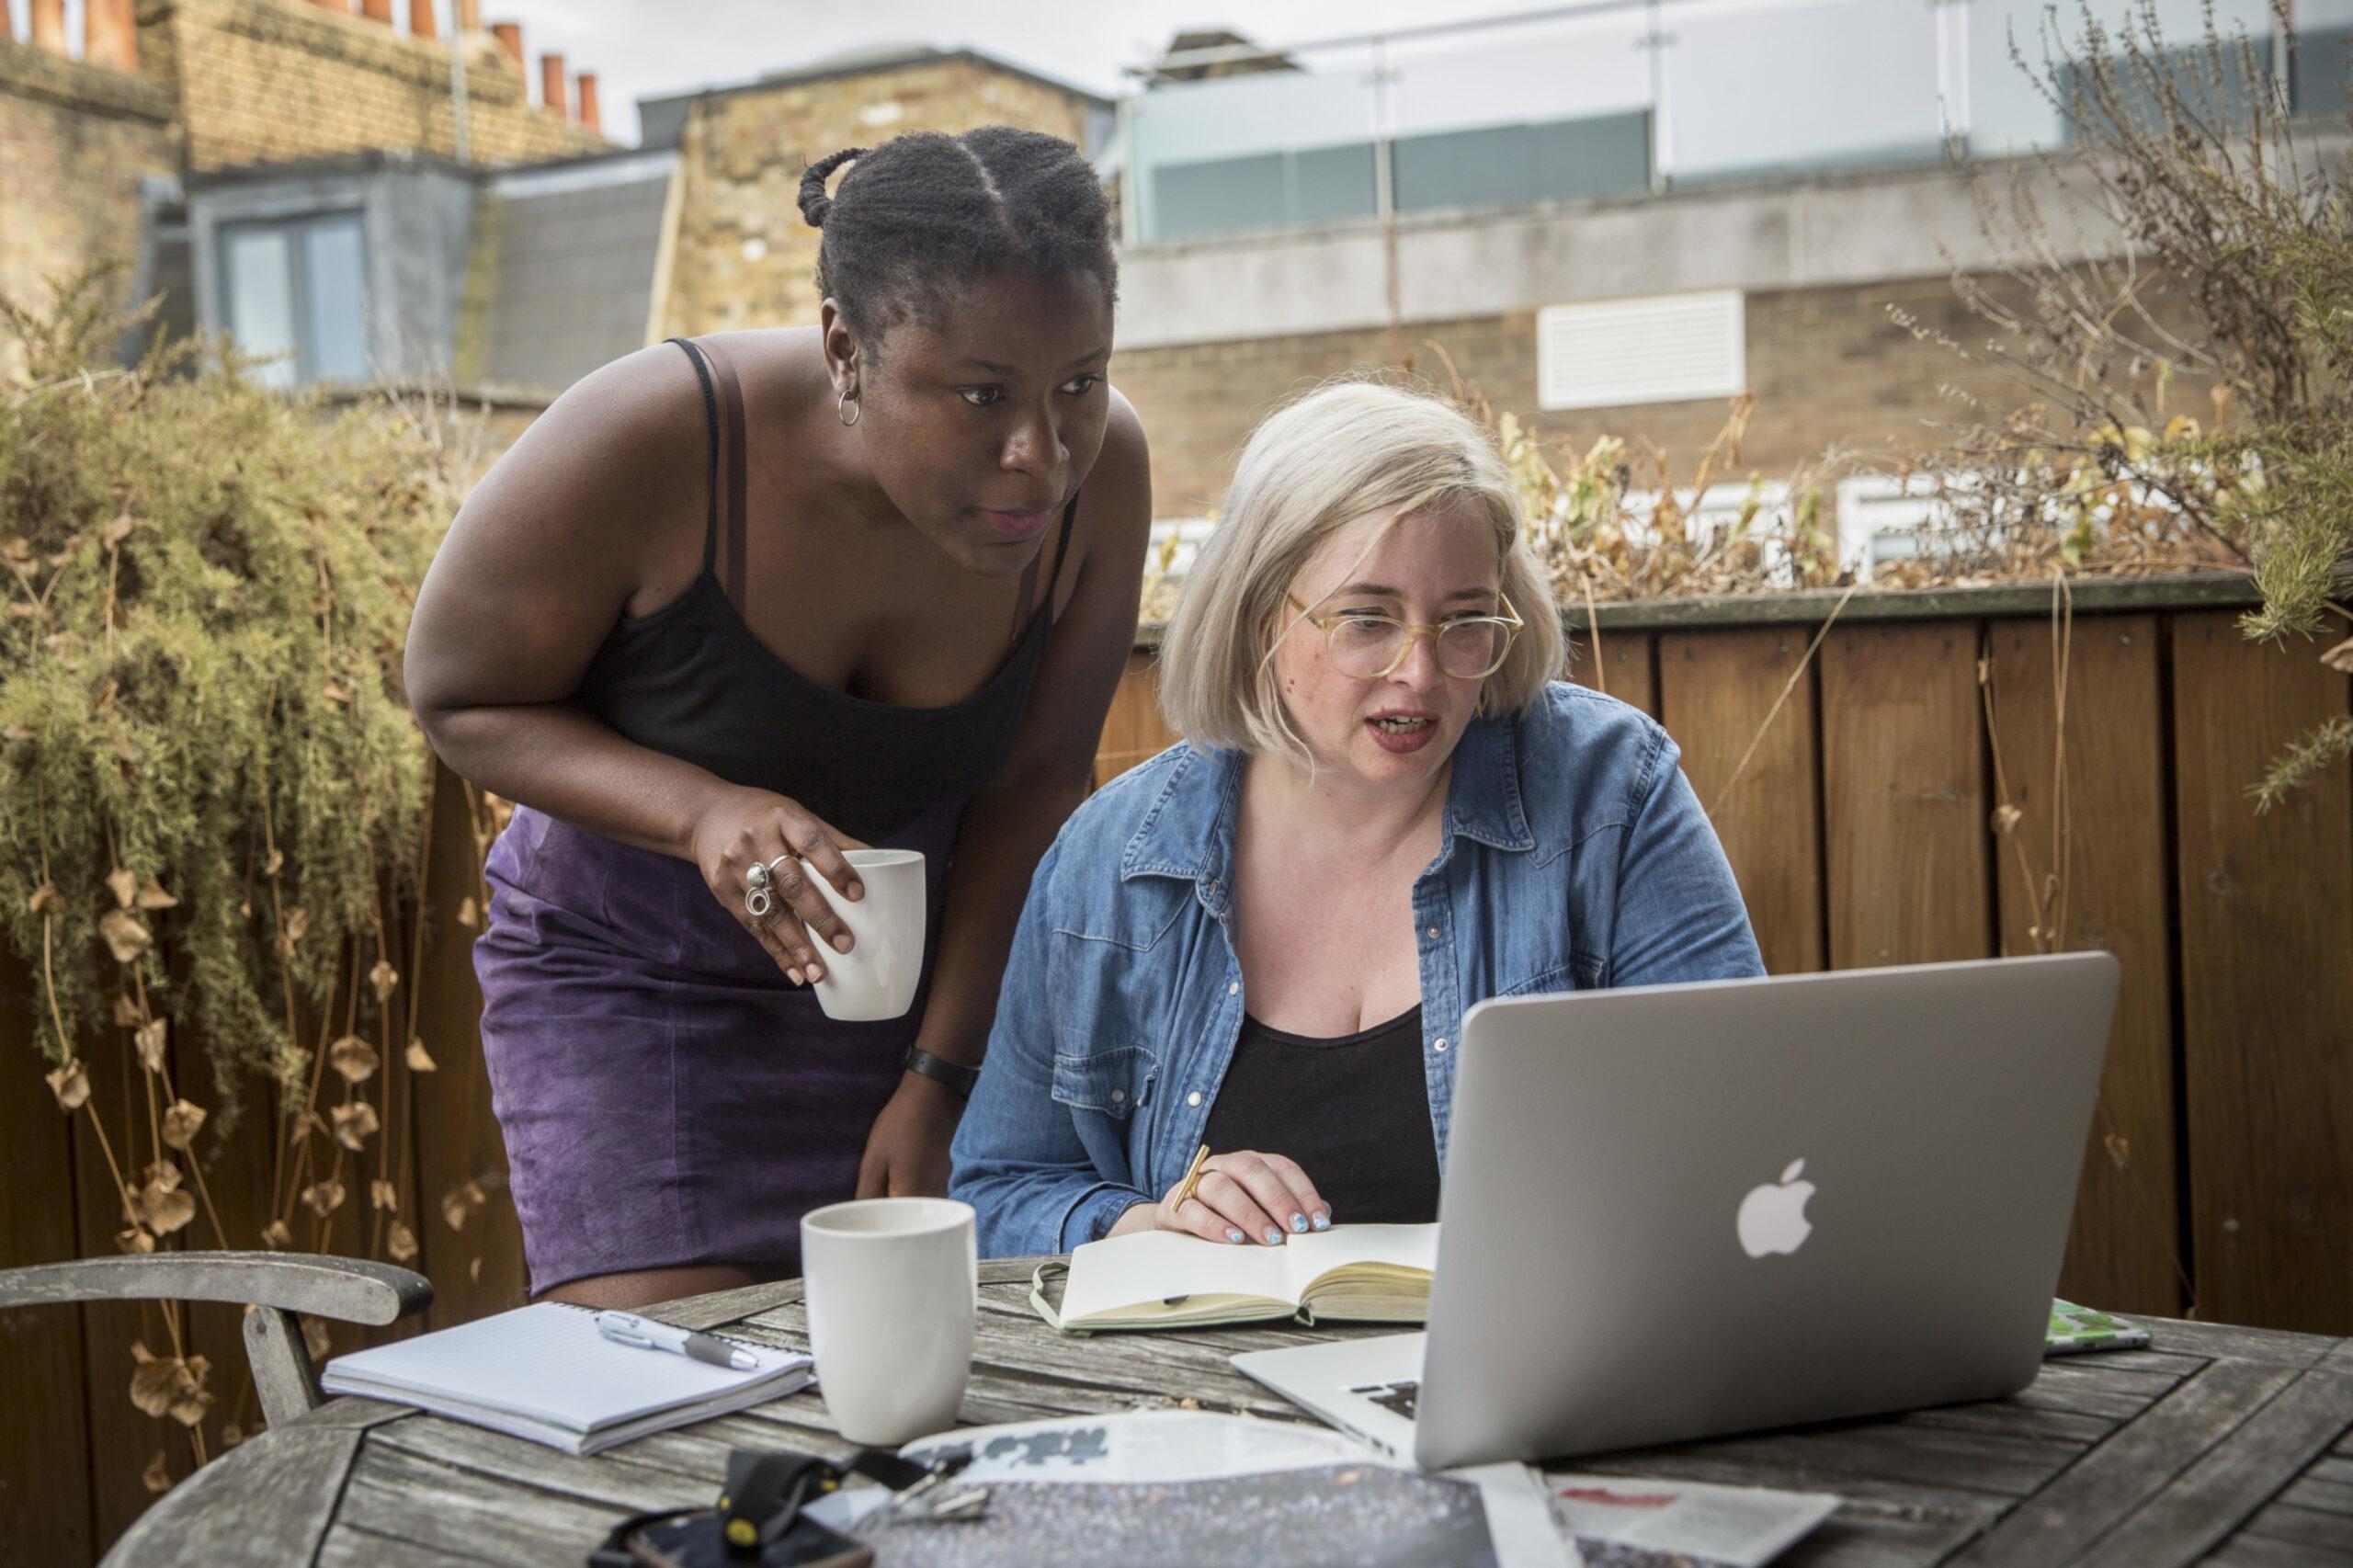 Bureau Local community organisers, Eliza (now at The Correspondent) and Rachel